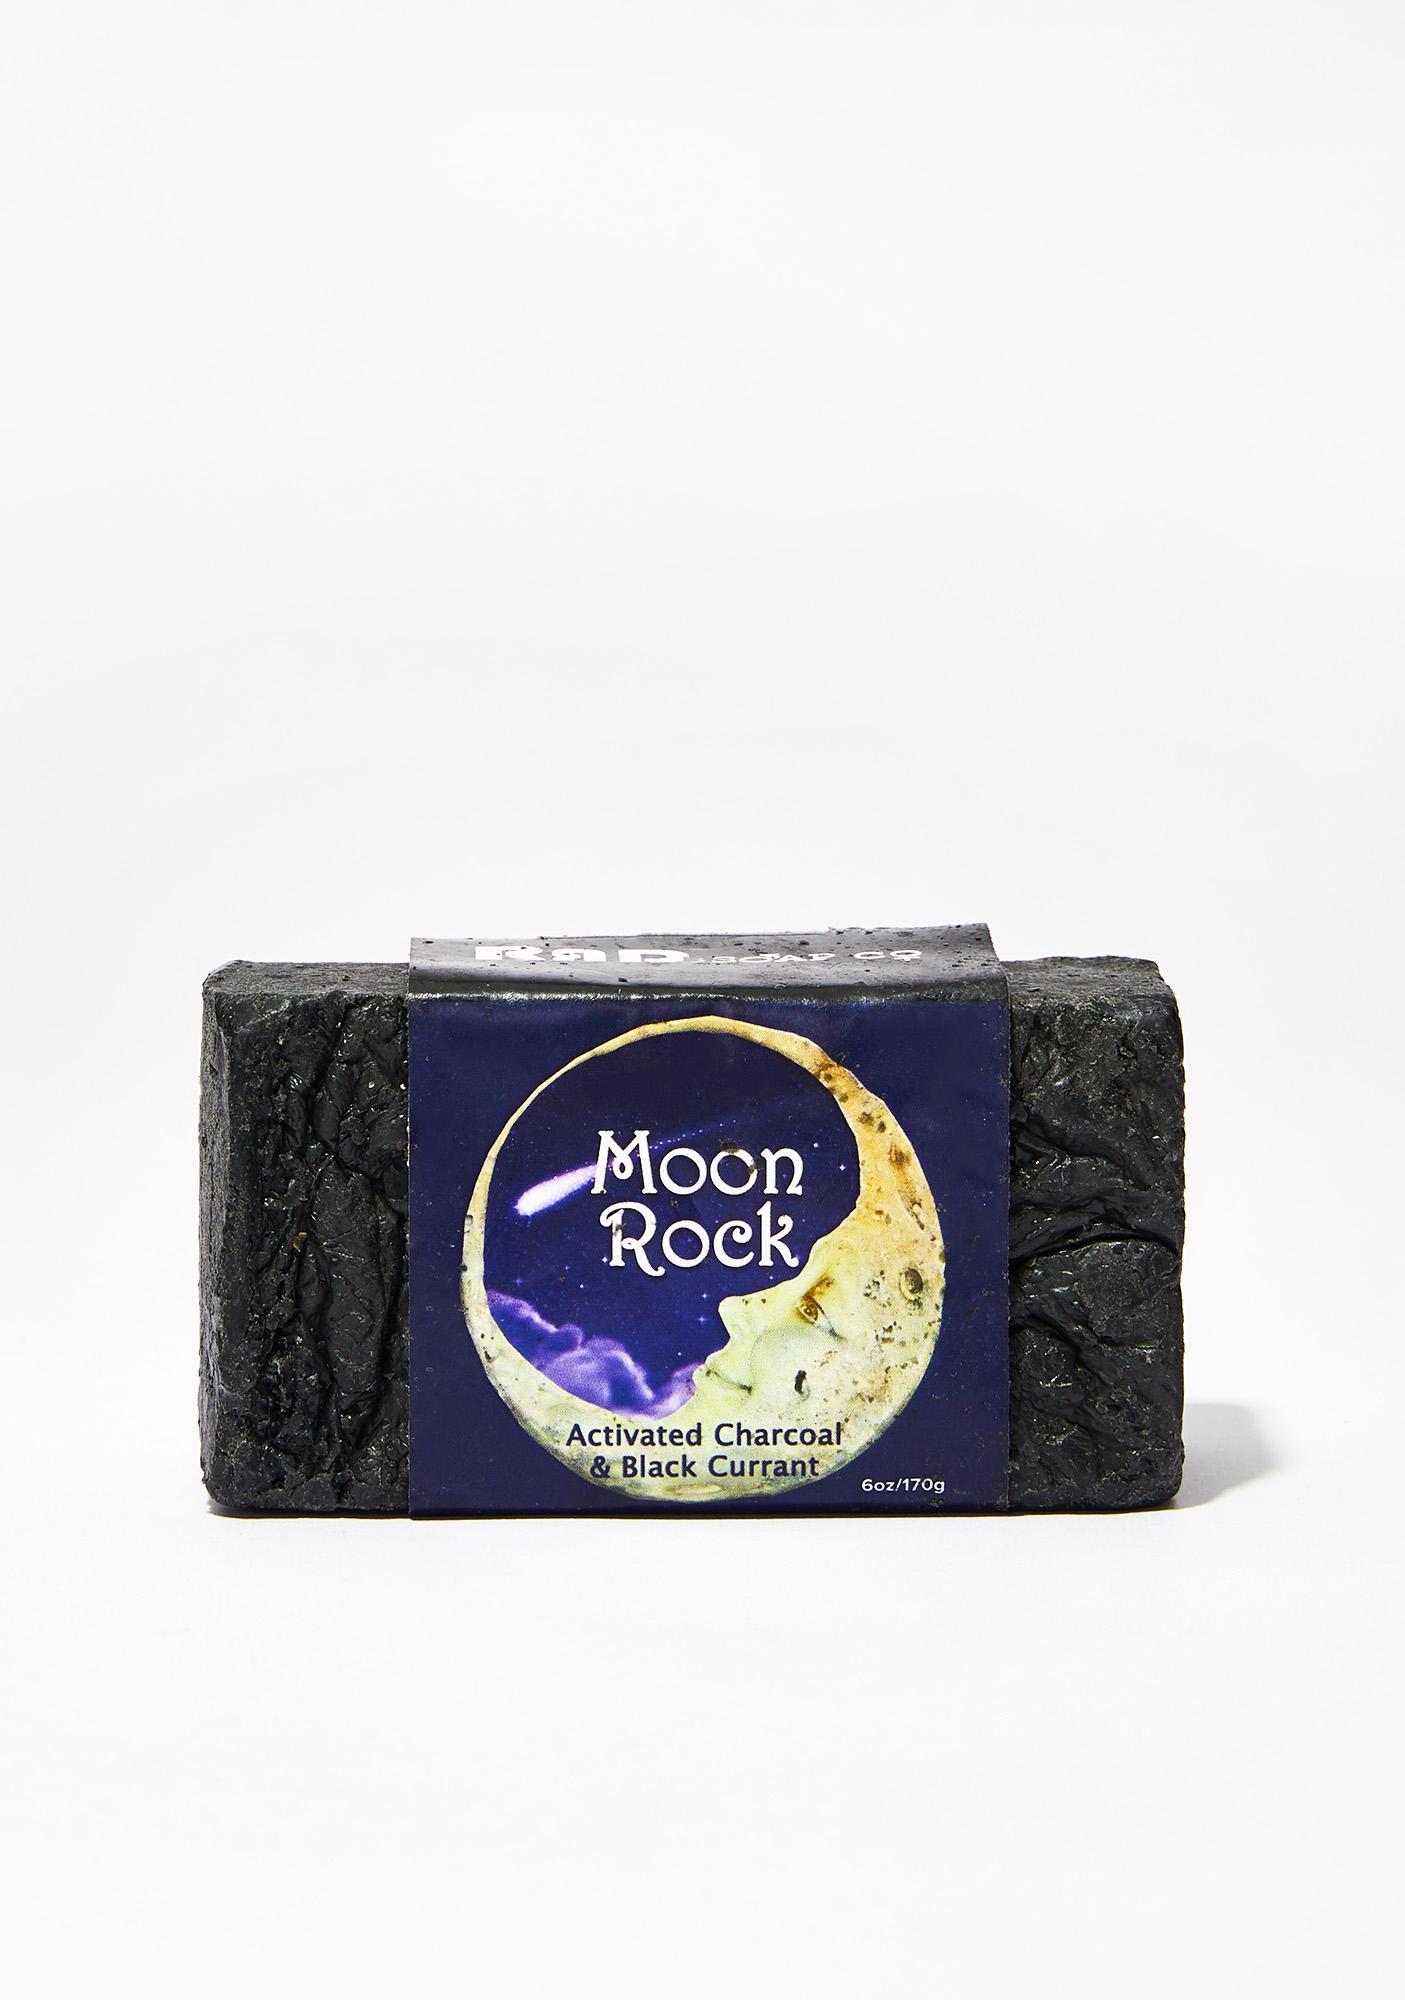 Rad Soap Co. Moon Rock Body Bar